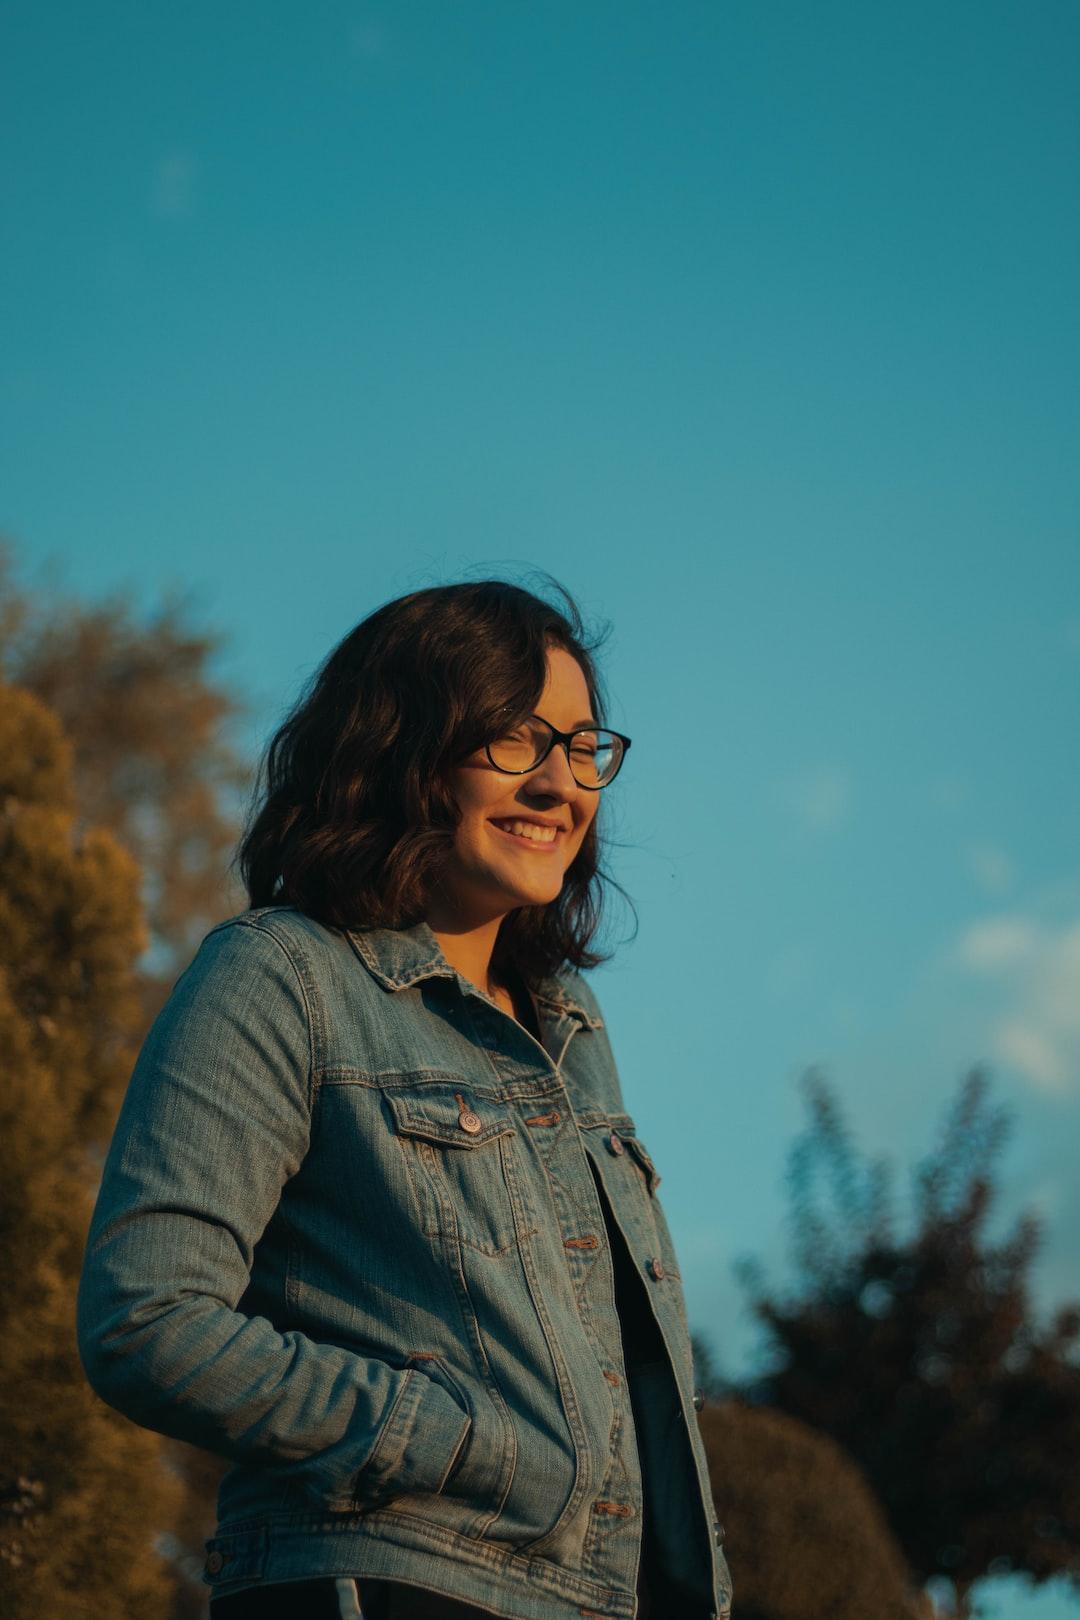 smiling girl at park